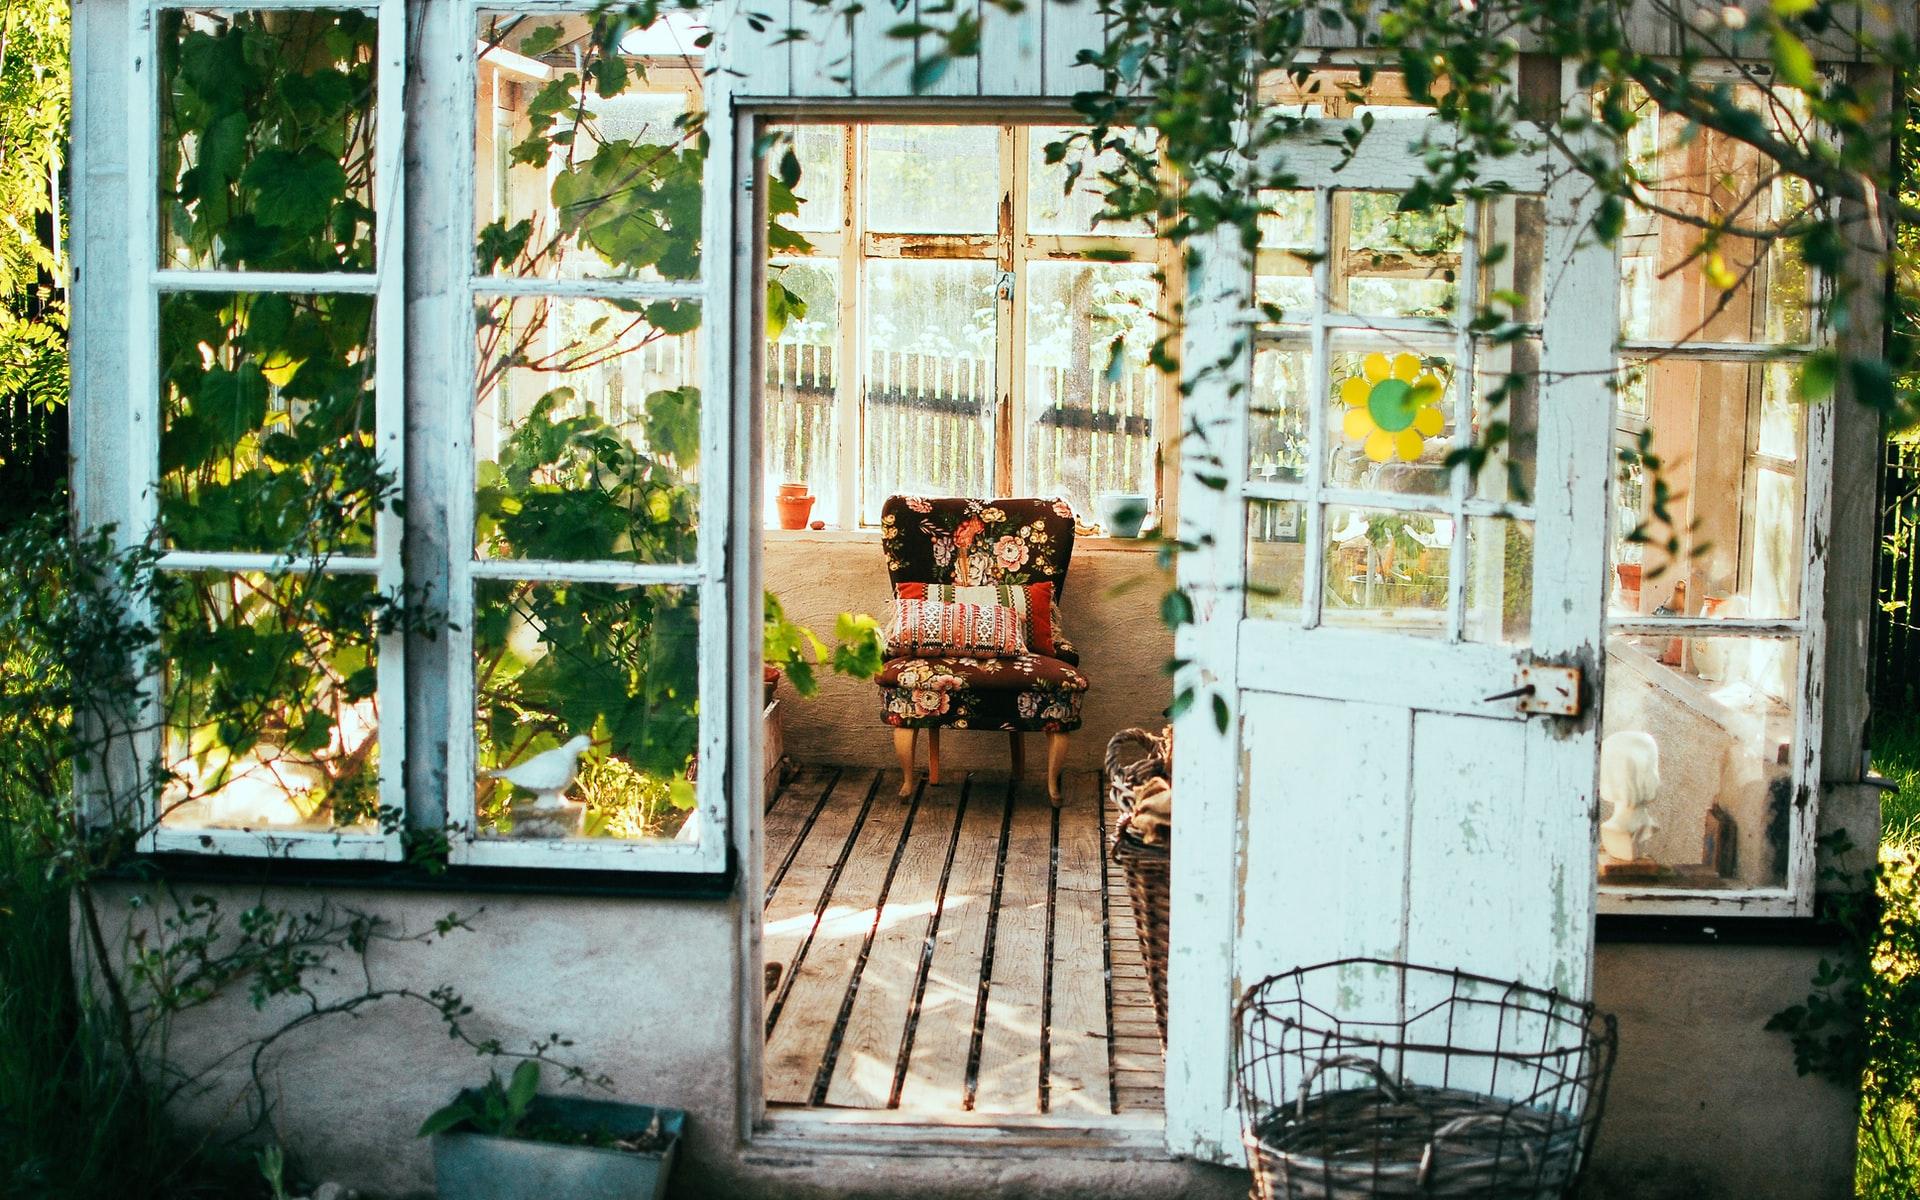 Gartenarbeit im Juni auf dem Gemüsebalkon